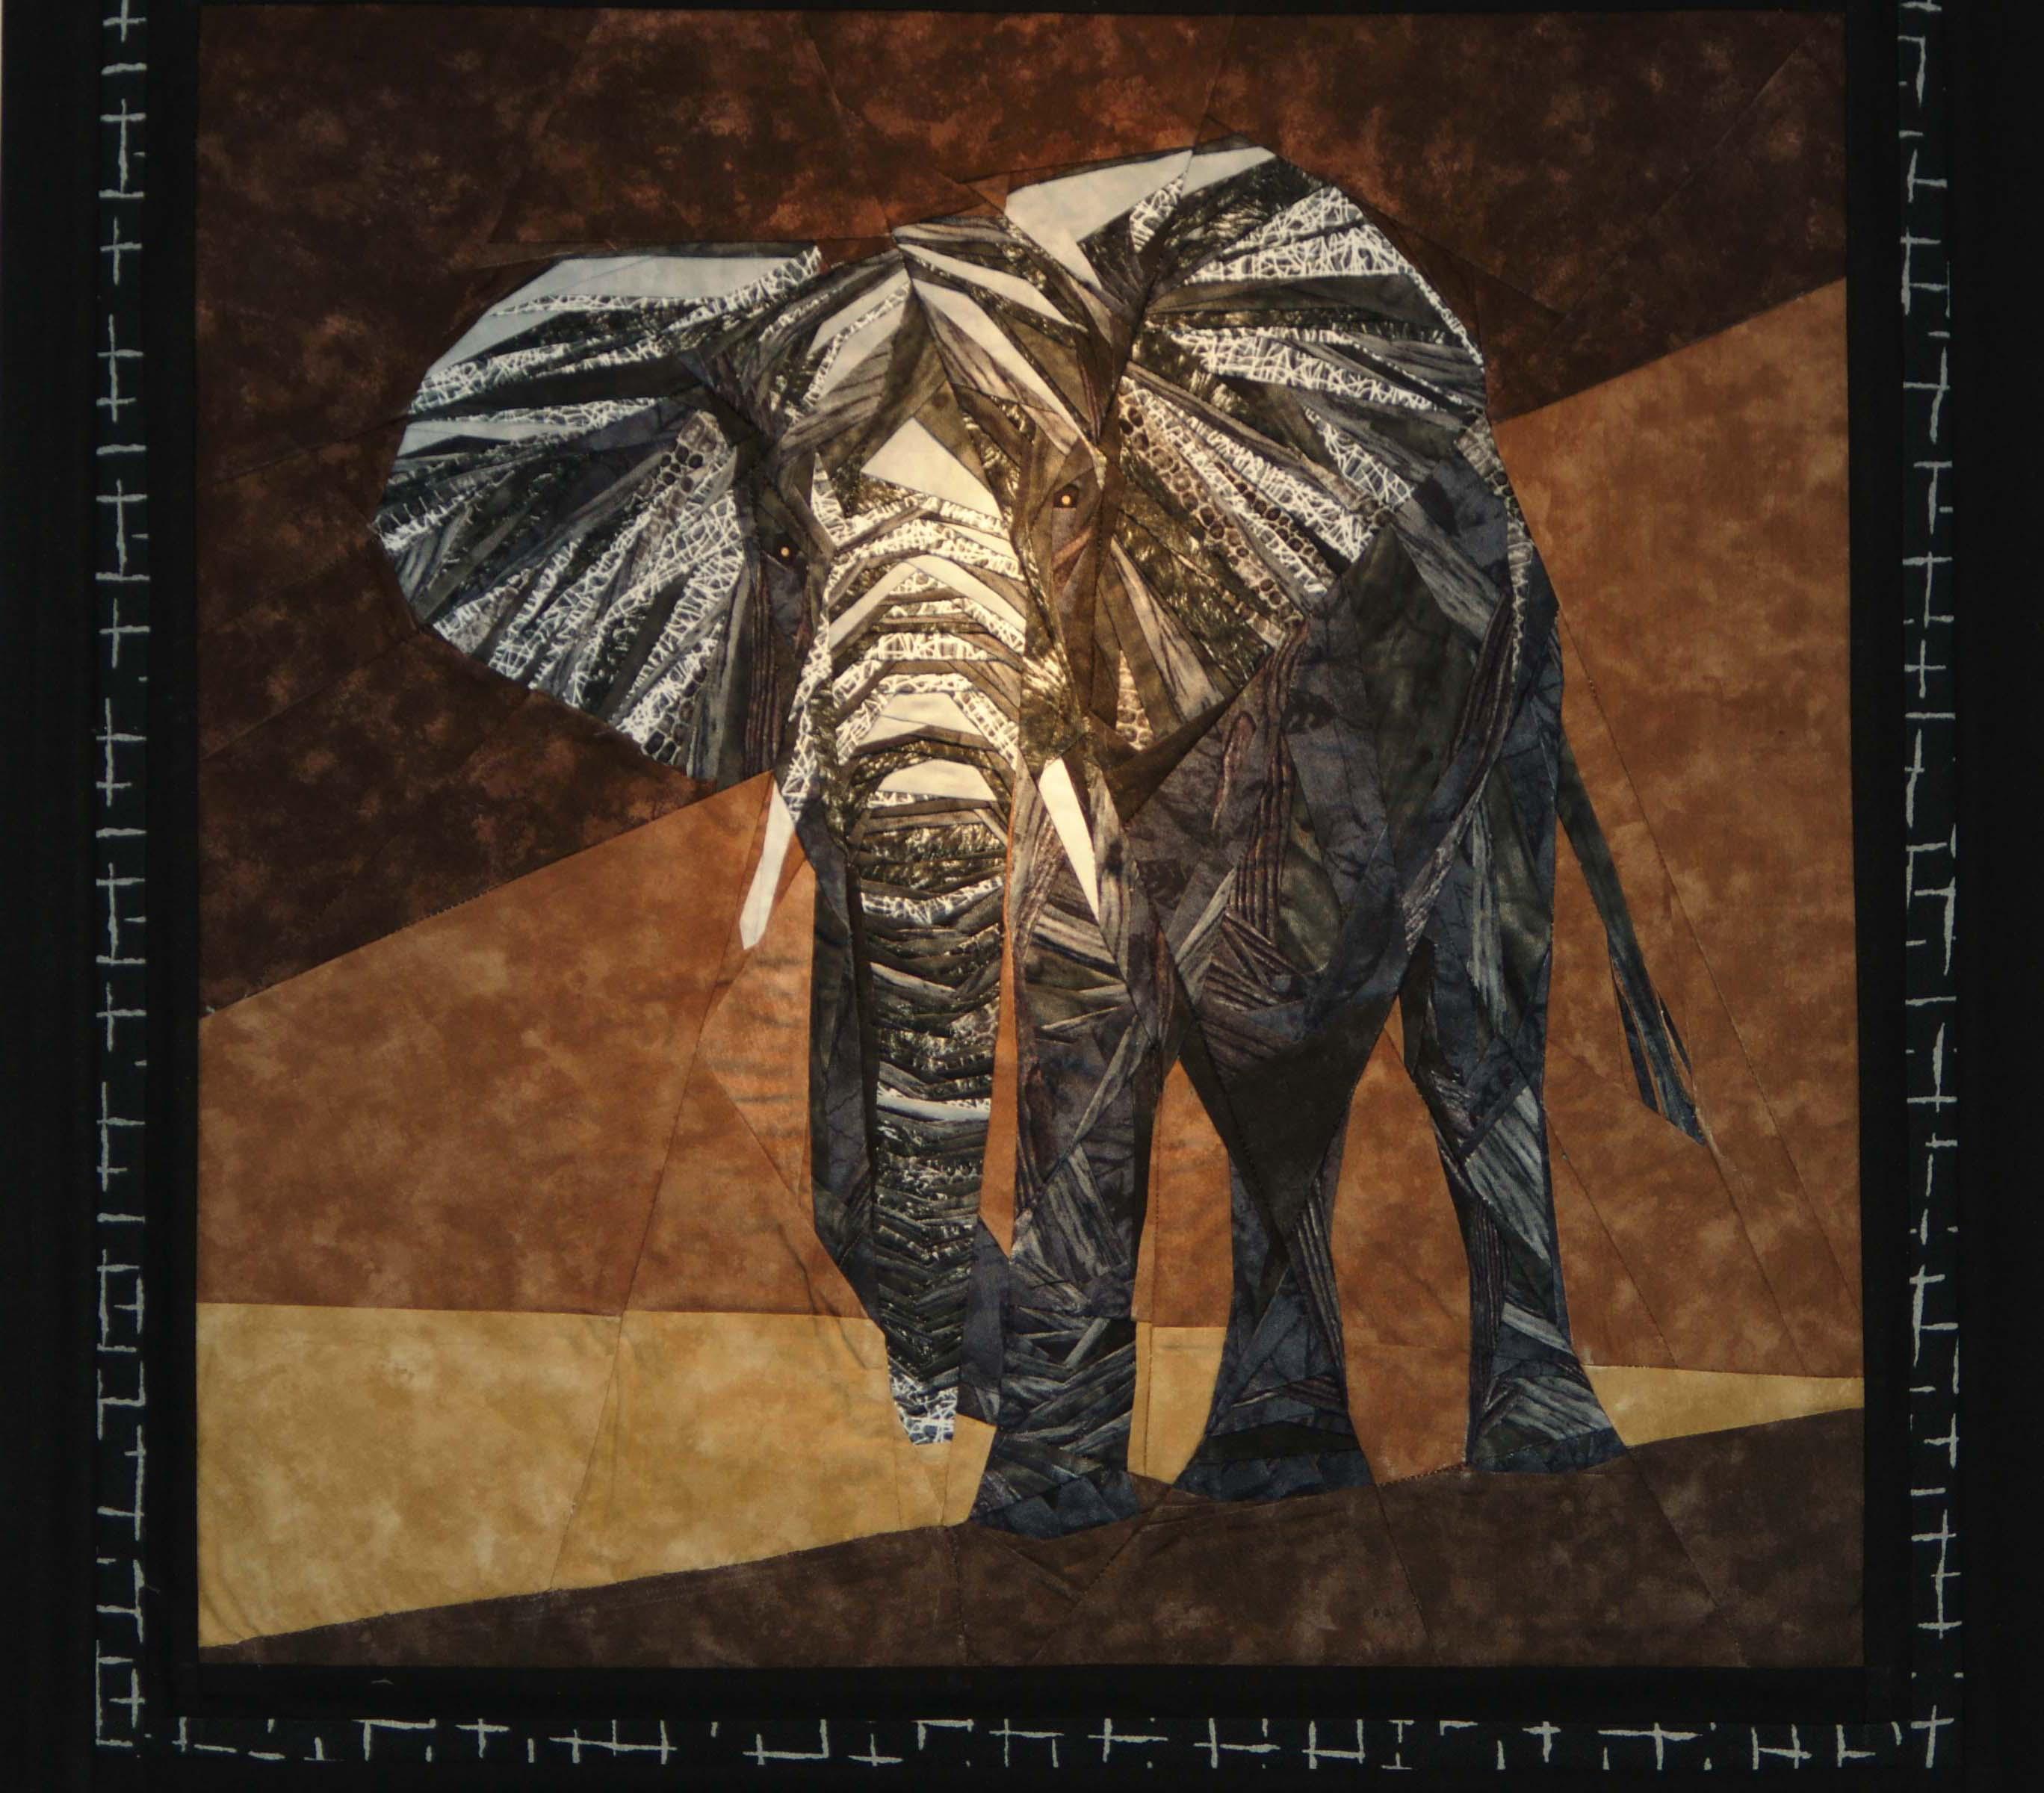 dsc01585-norman-the-elephant.jpg